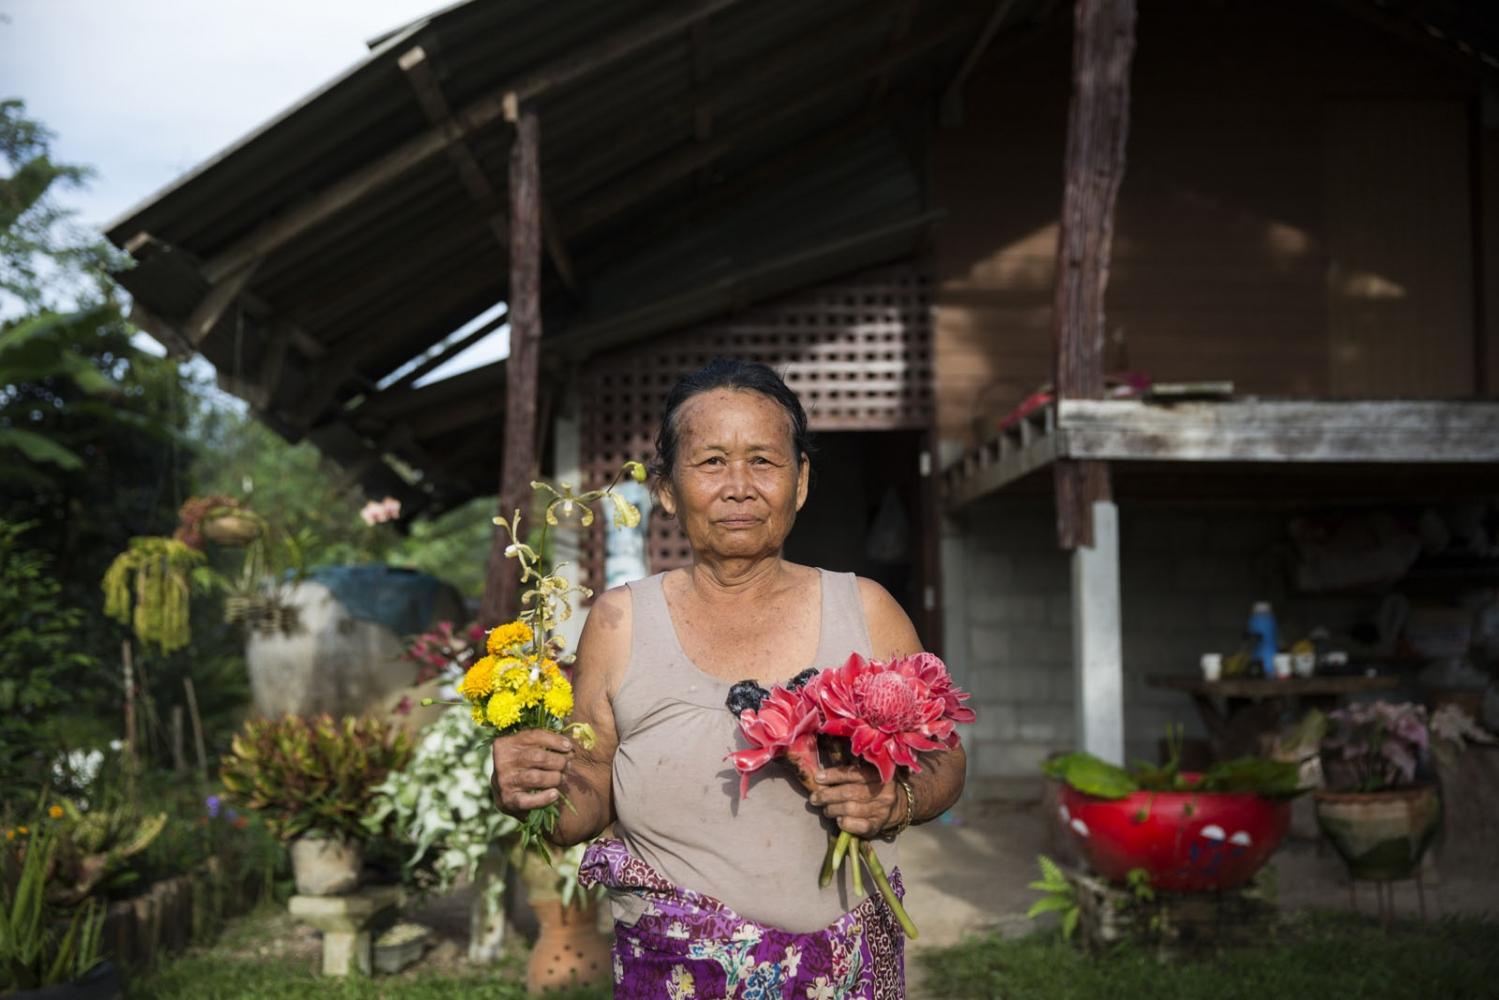 Rattana Seli, 66, holds flowers she grew in her garden outside a neighbours house.